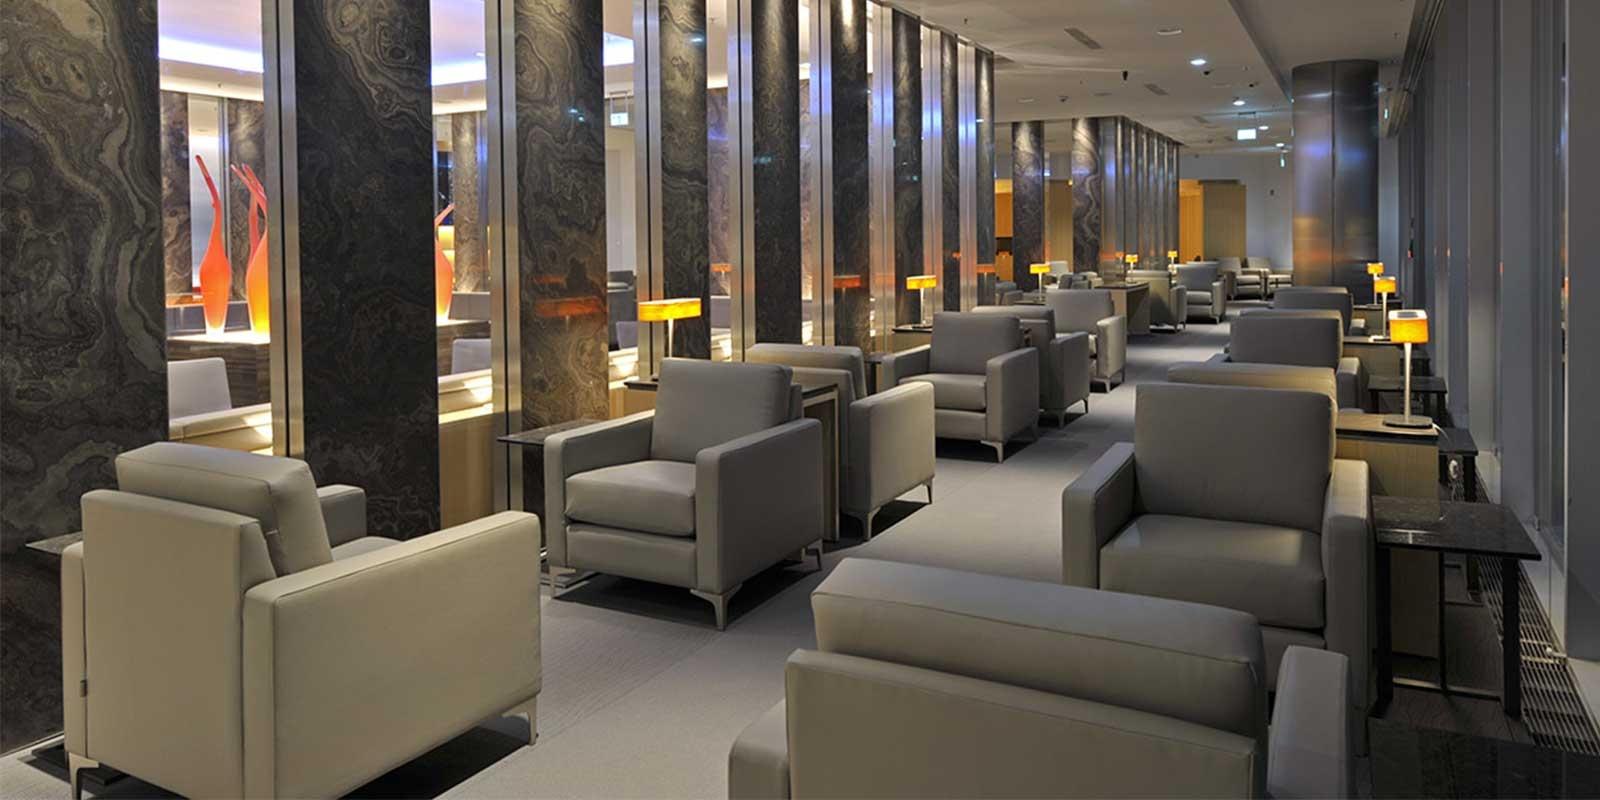 maple-leaf-lounge-1600x800